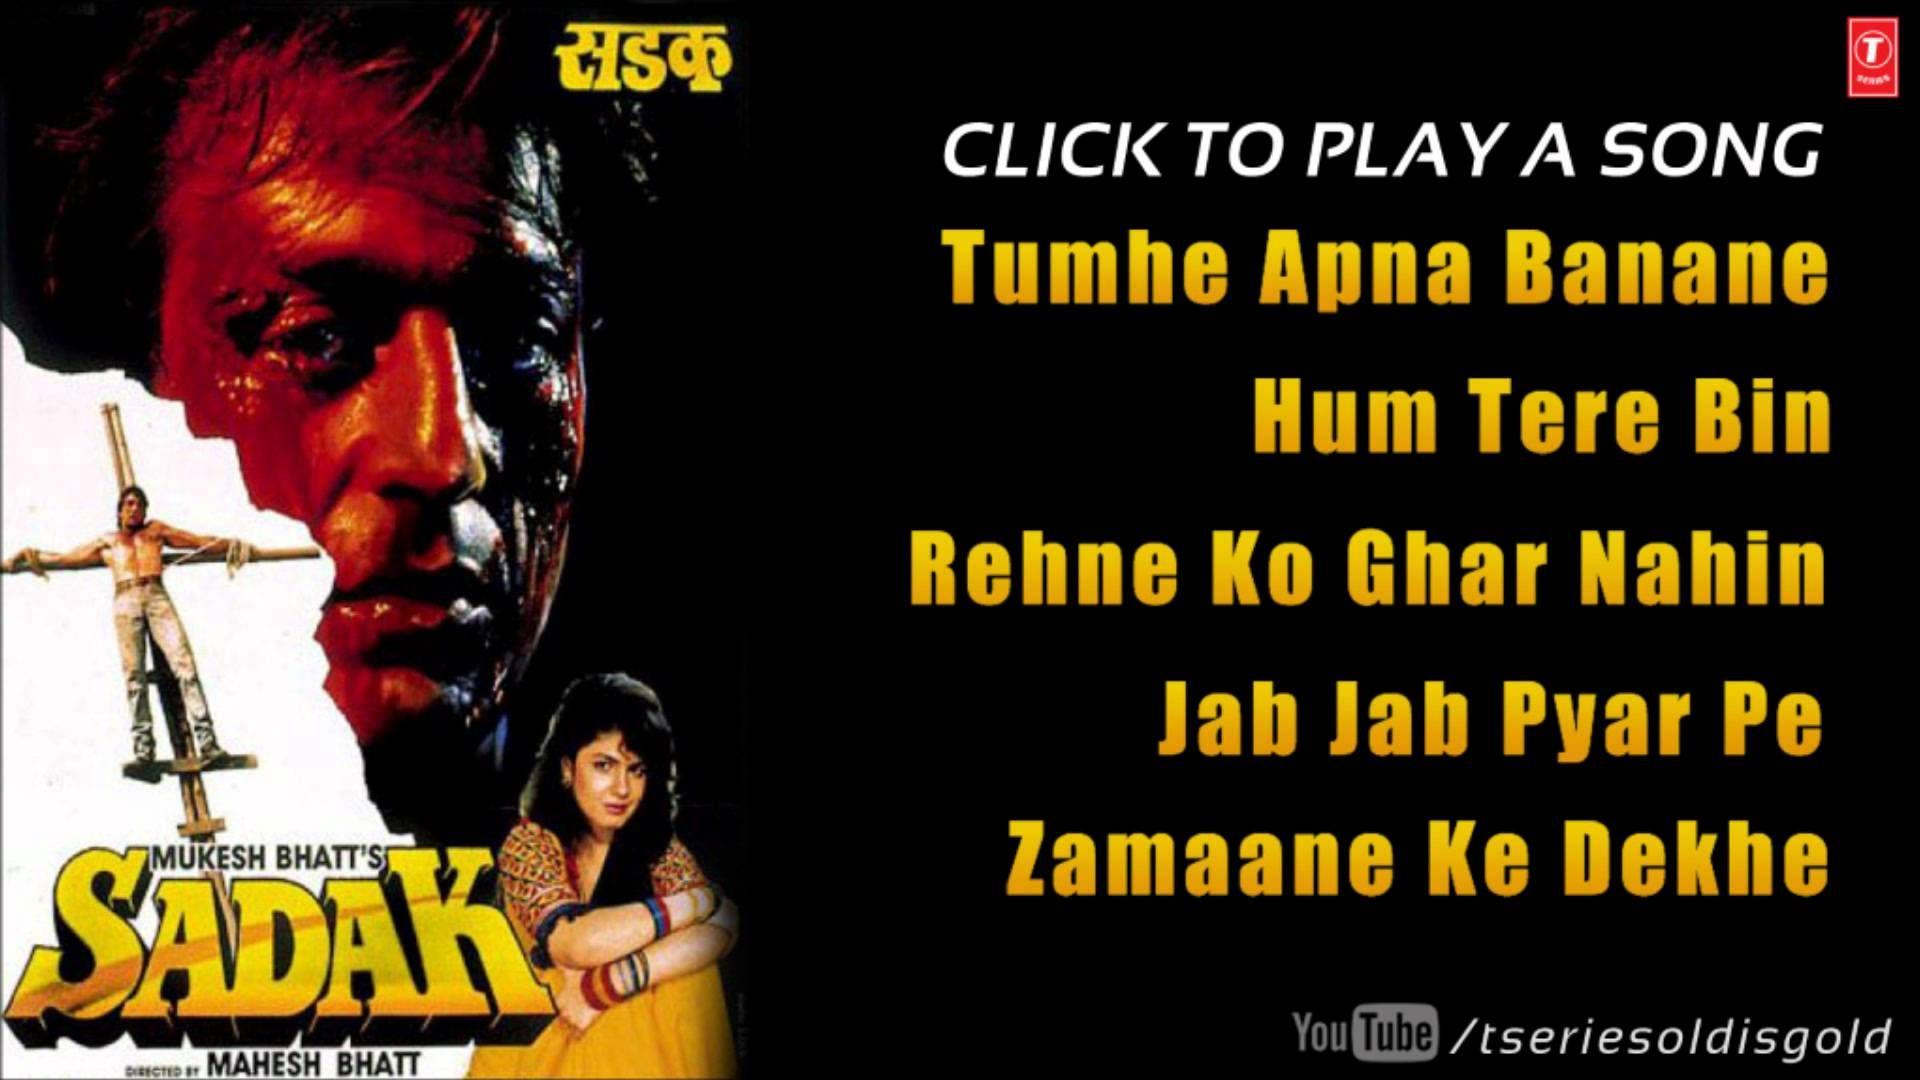 Sadak Full Songs Audio Sanjay Dutt Pooja Bhatt Jukebox Jukebox Songs Audio Songs